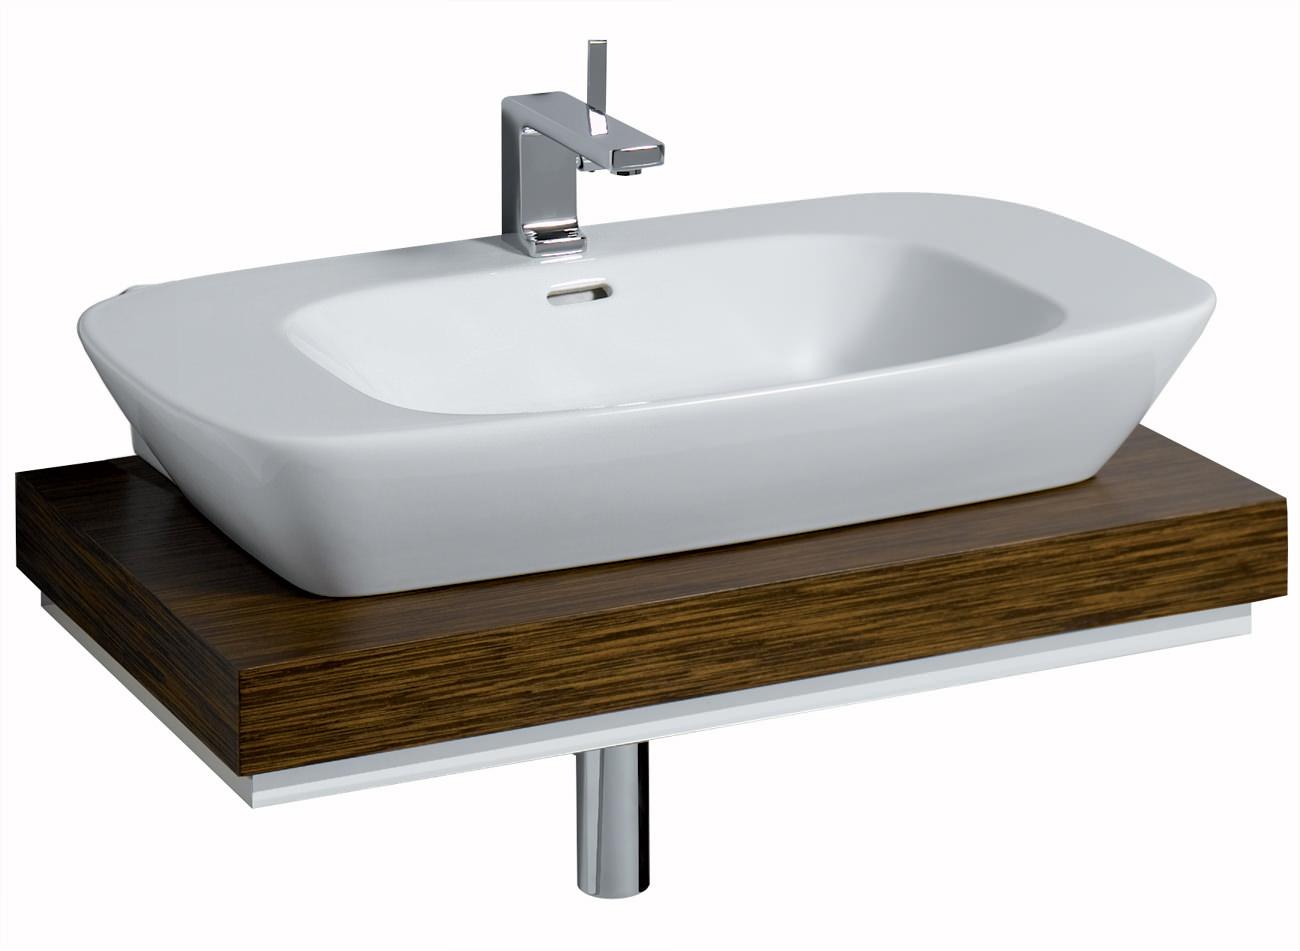 Countertop Shelf : ... of Twyford Vello 800mm Countertop Basin And 800mm Shelf - VO4741WH